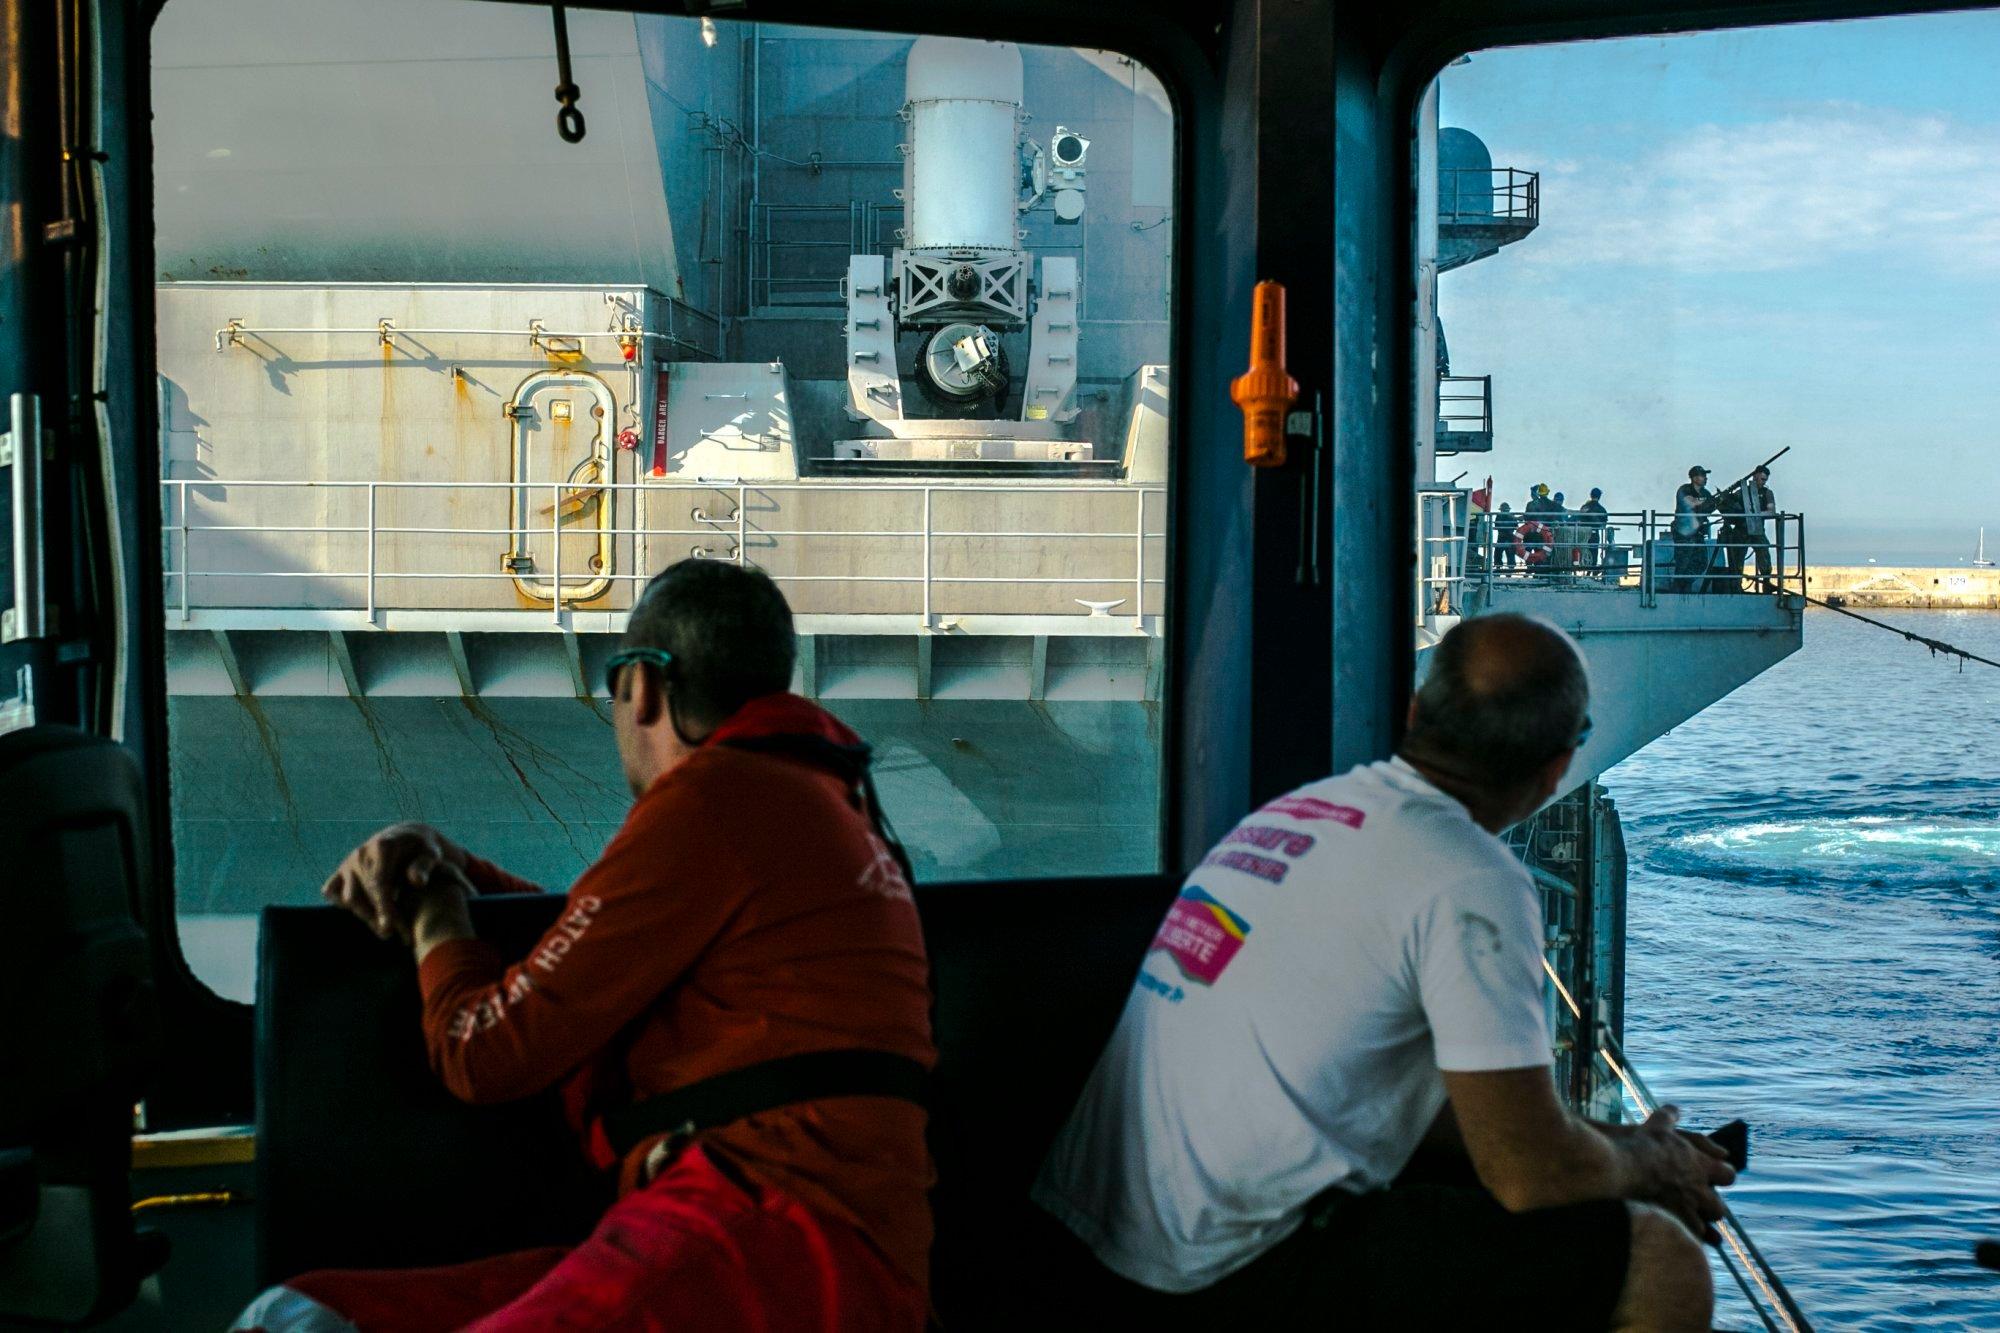 marin-porte-avion-cargo-mer-photographe-professionnel